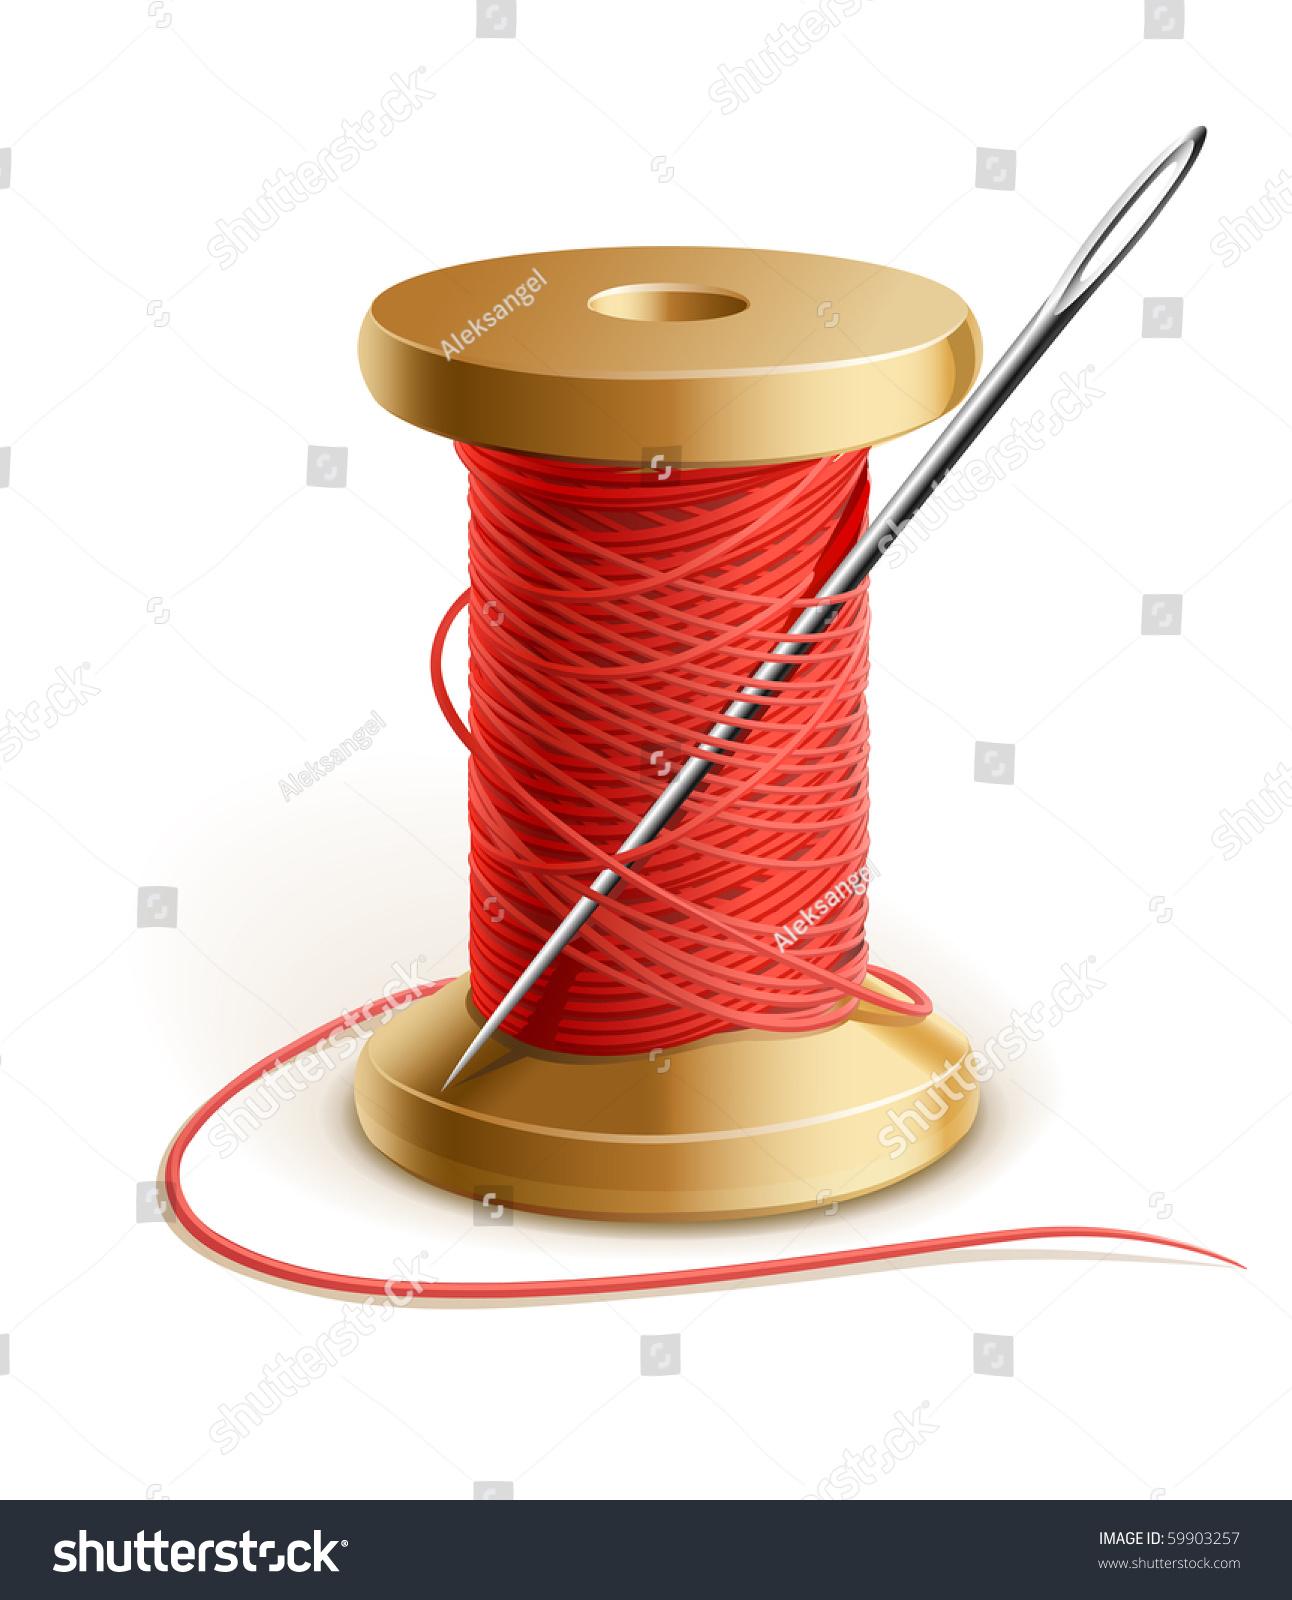 reel thread needle vector illustration isolated stock vector 59903257 shutterstock. Black Bedroom Furniture Sets. Home Design Ideas